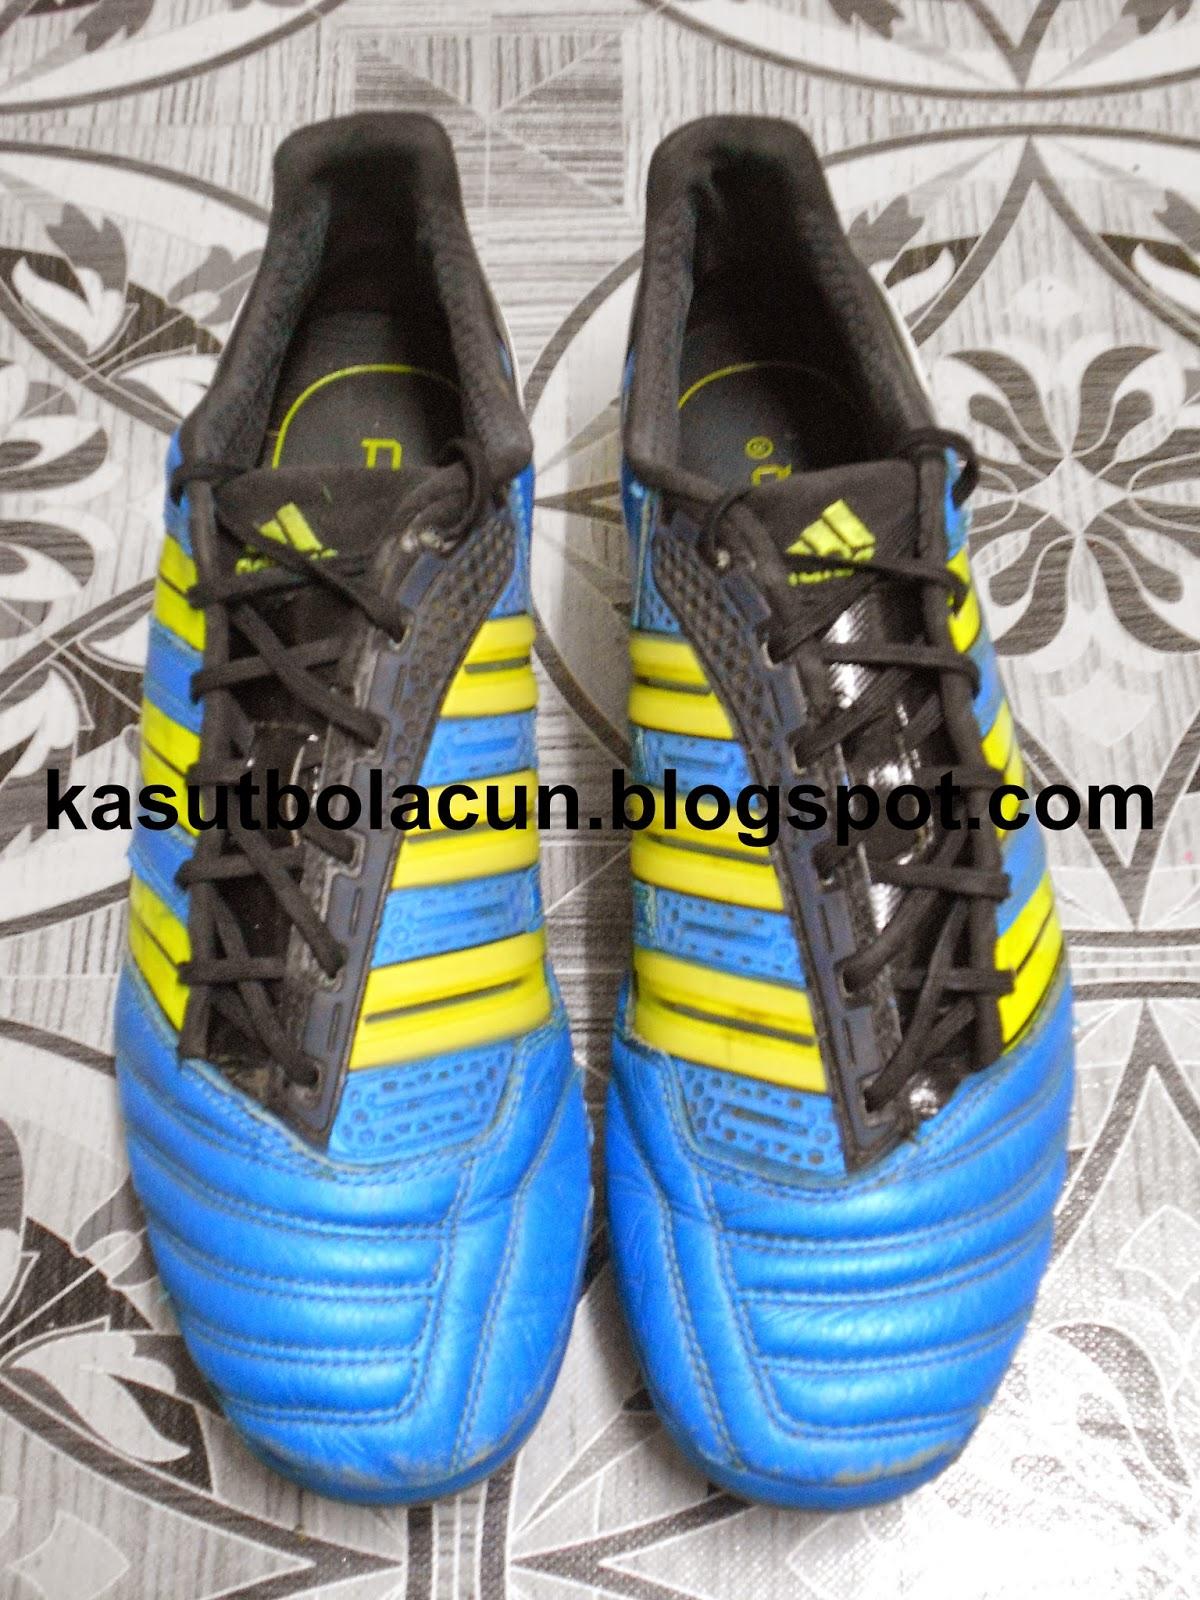 http://kasutbolacun.blogspot.com/2015/03/adidas-adipower-predator-sg_11.html